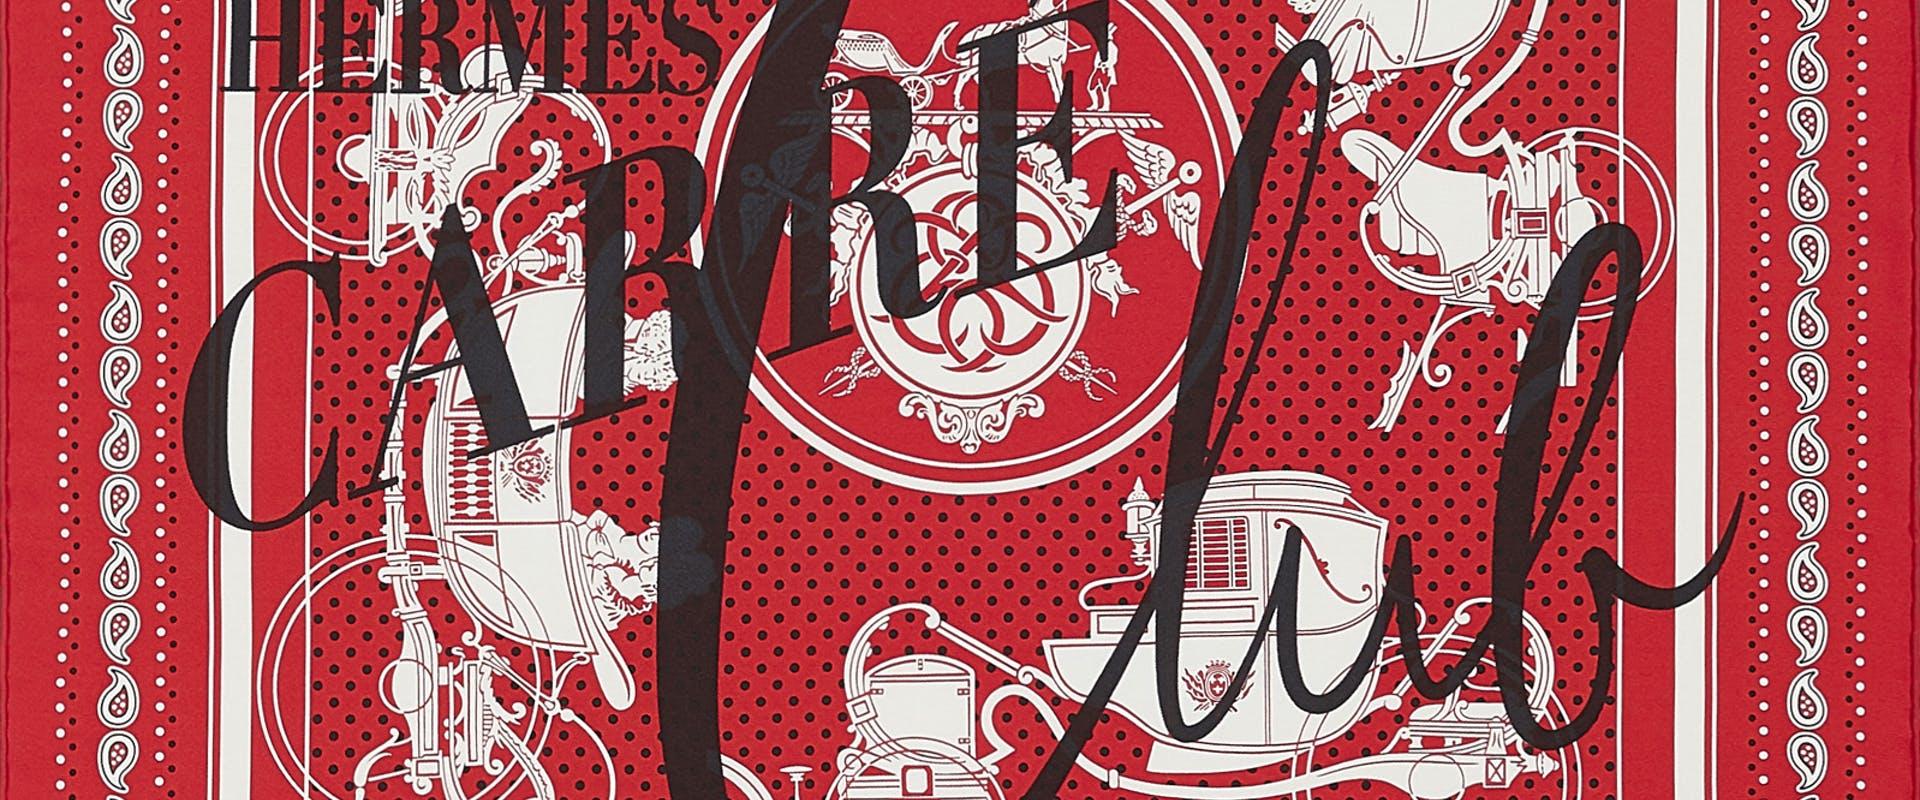 1538709157230855-Ex-Libris-bandana-55-in-silk-twill